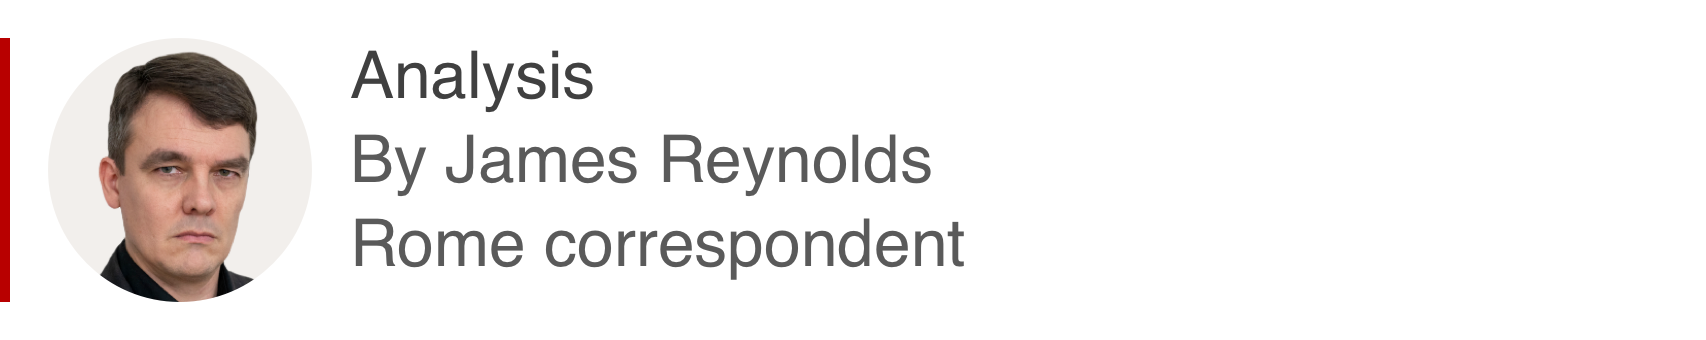 Analysis box by James Reynolds, Rome correspondent